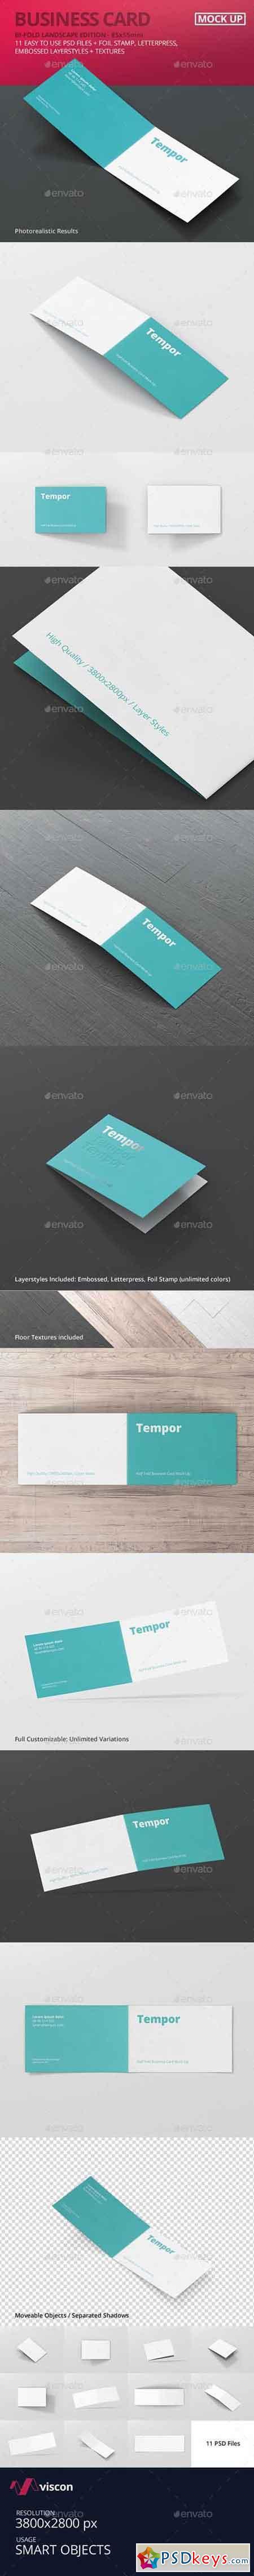 Folded Business Card Mockup 14251026